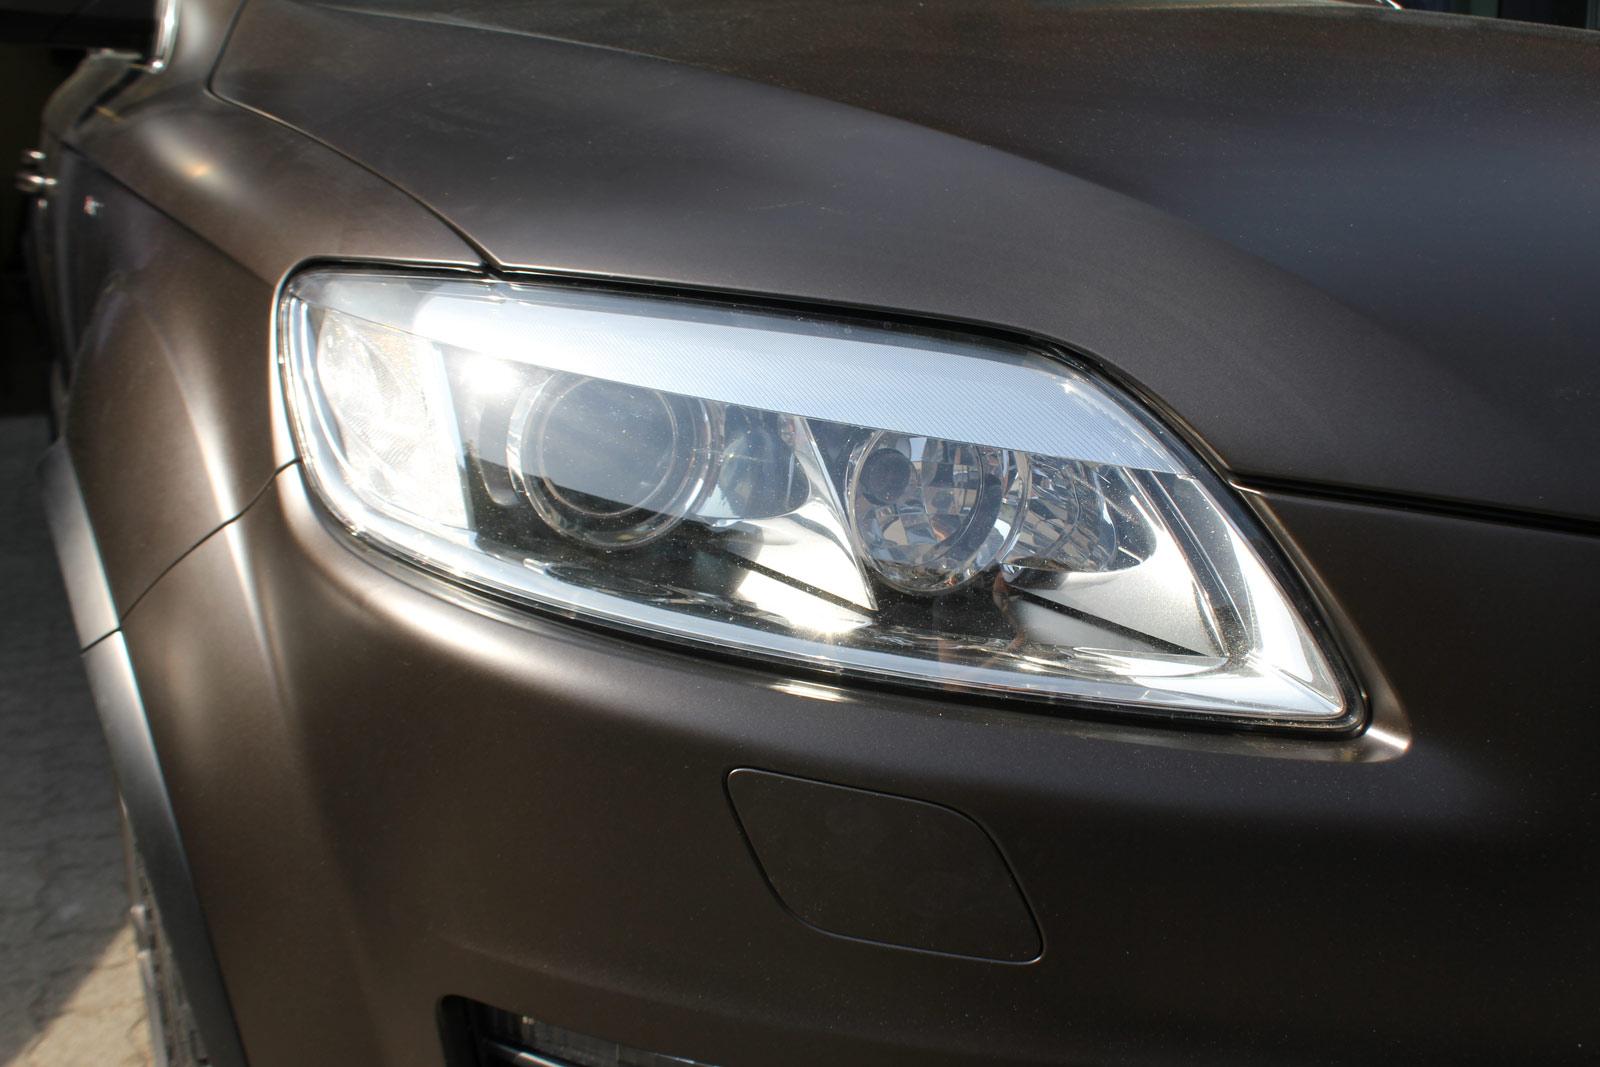 Audi_Q7_Folierung_Braun_Matt_Metallic_11